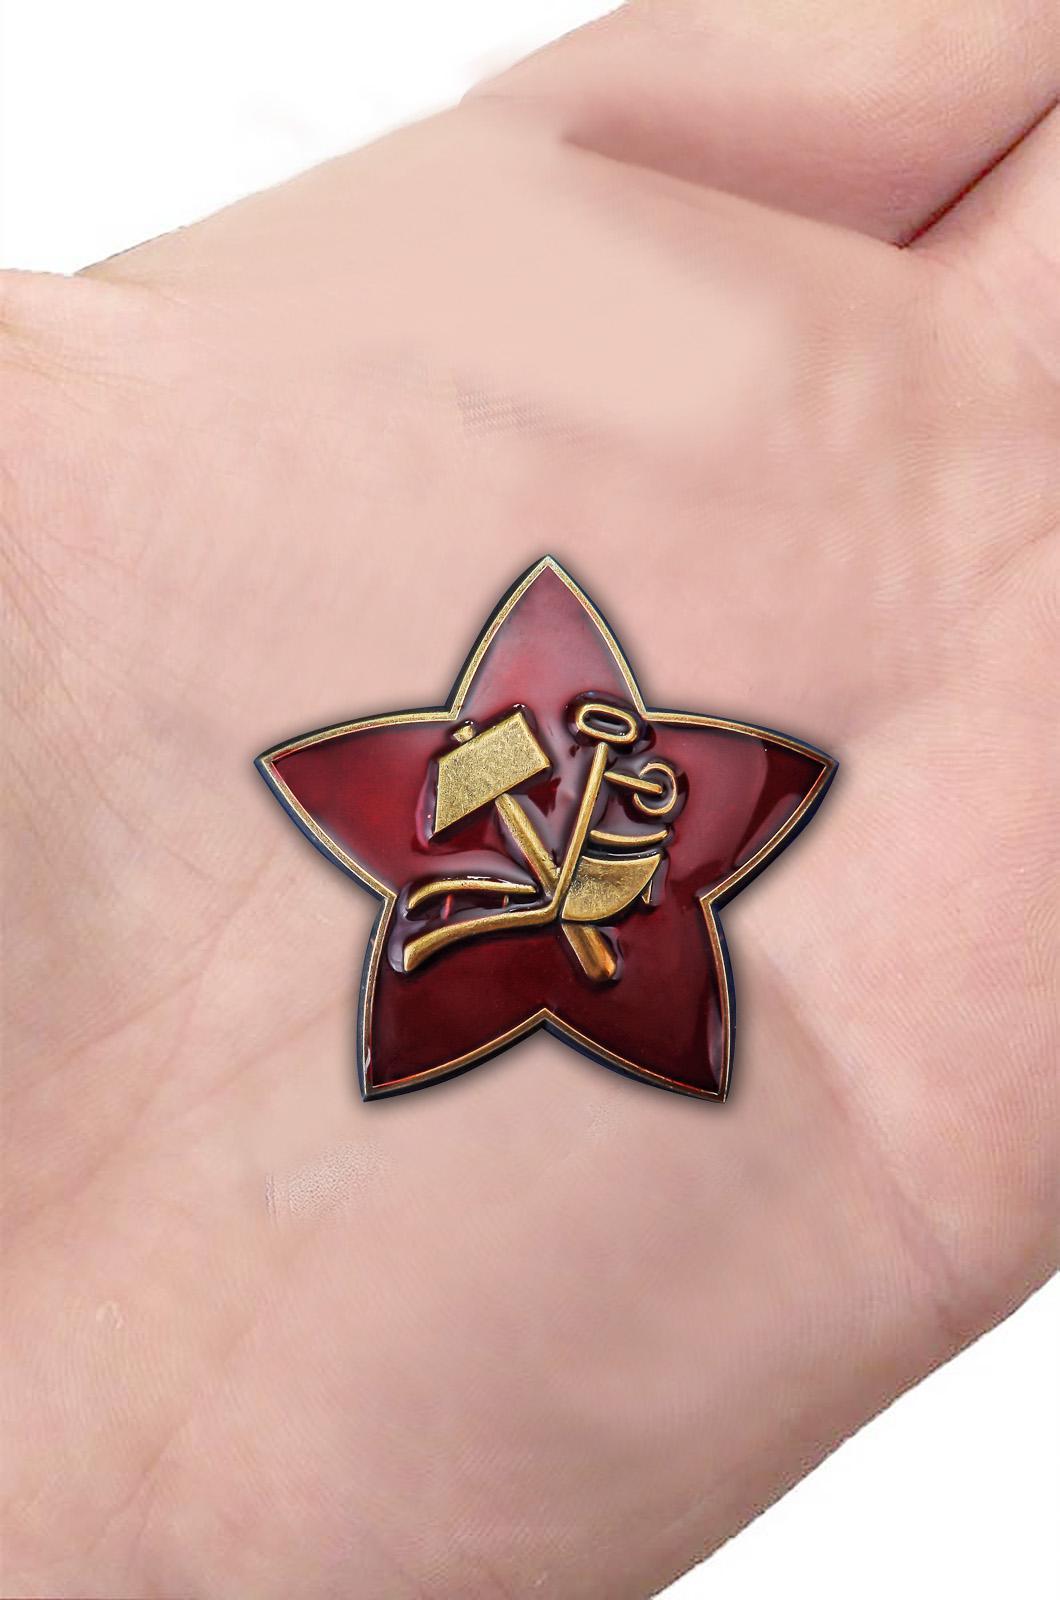 Латунная кокарда РККА 1918 г. - в красном презентабельном футляре - вид на ладони